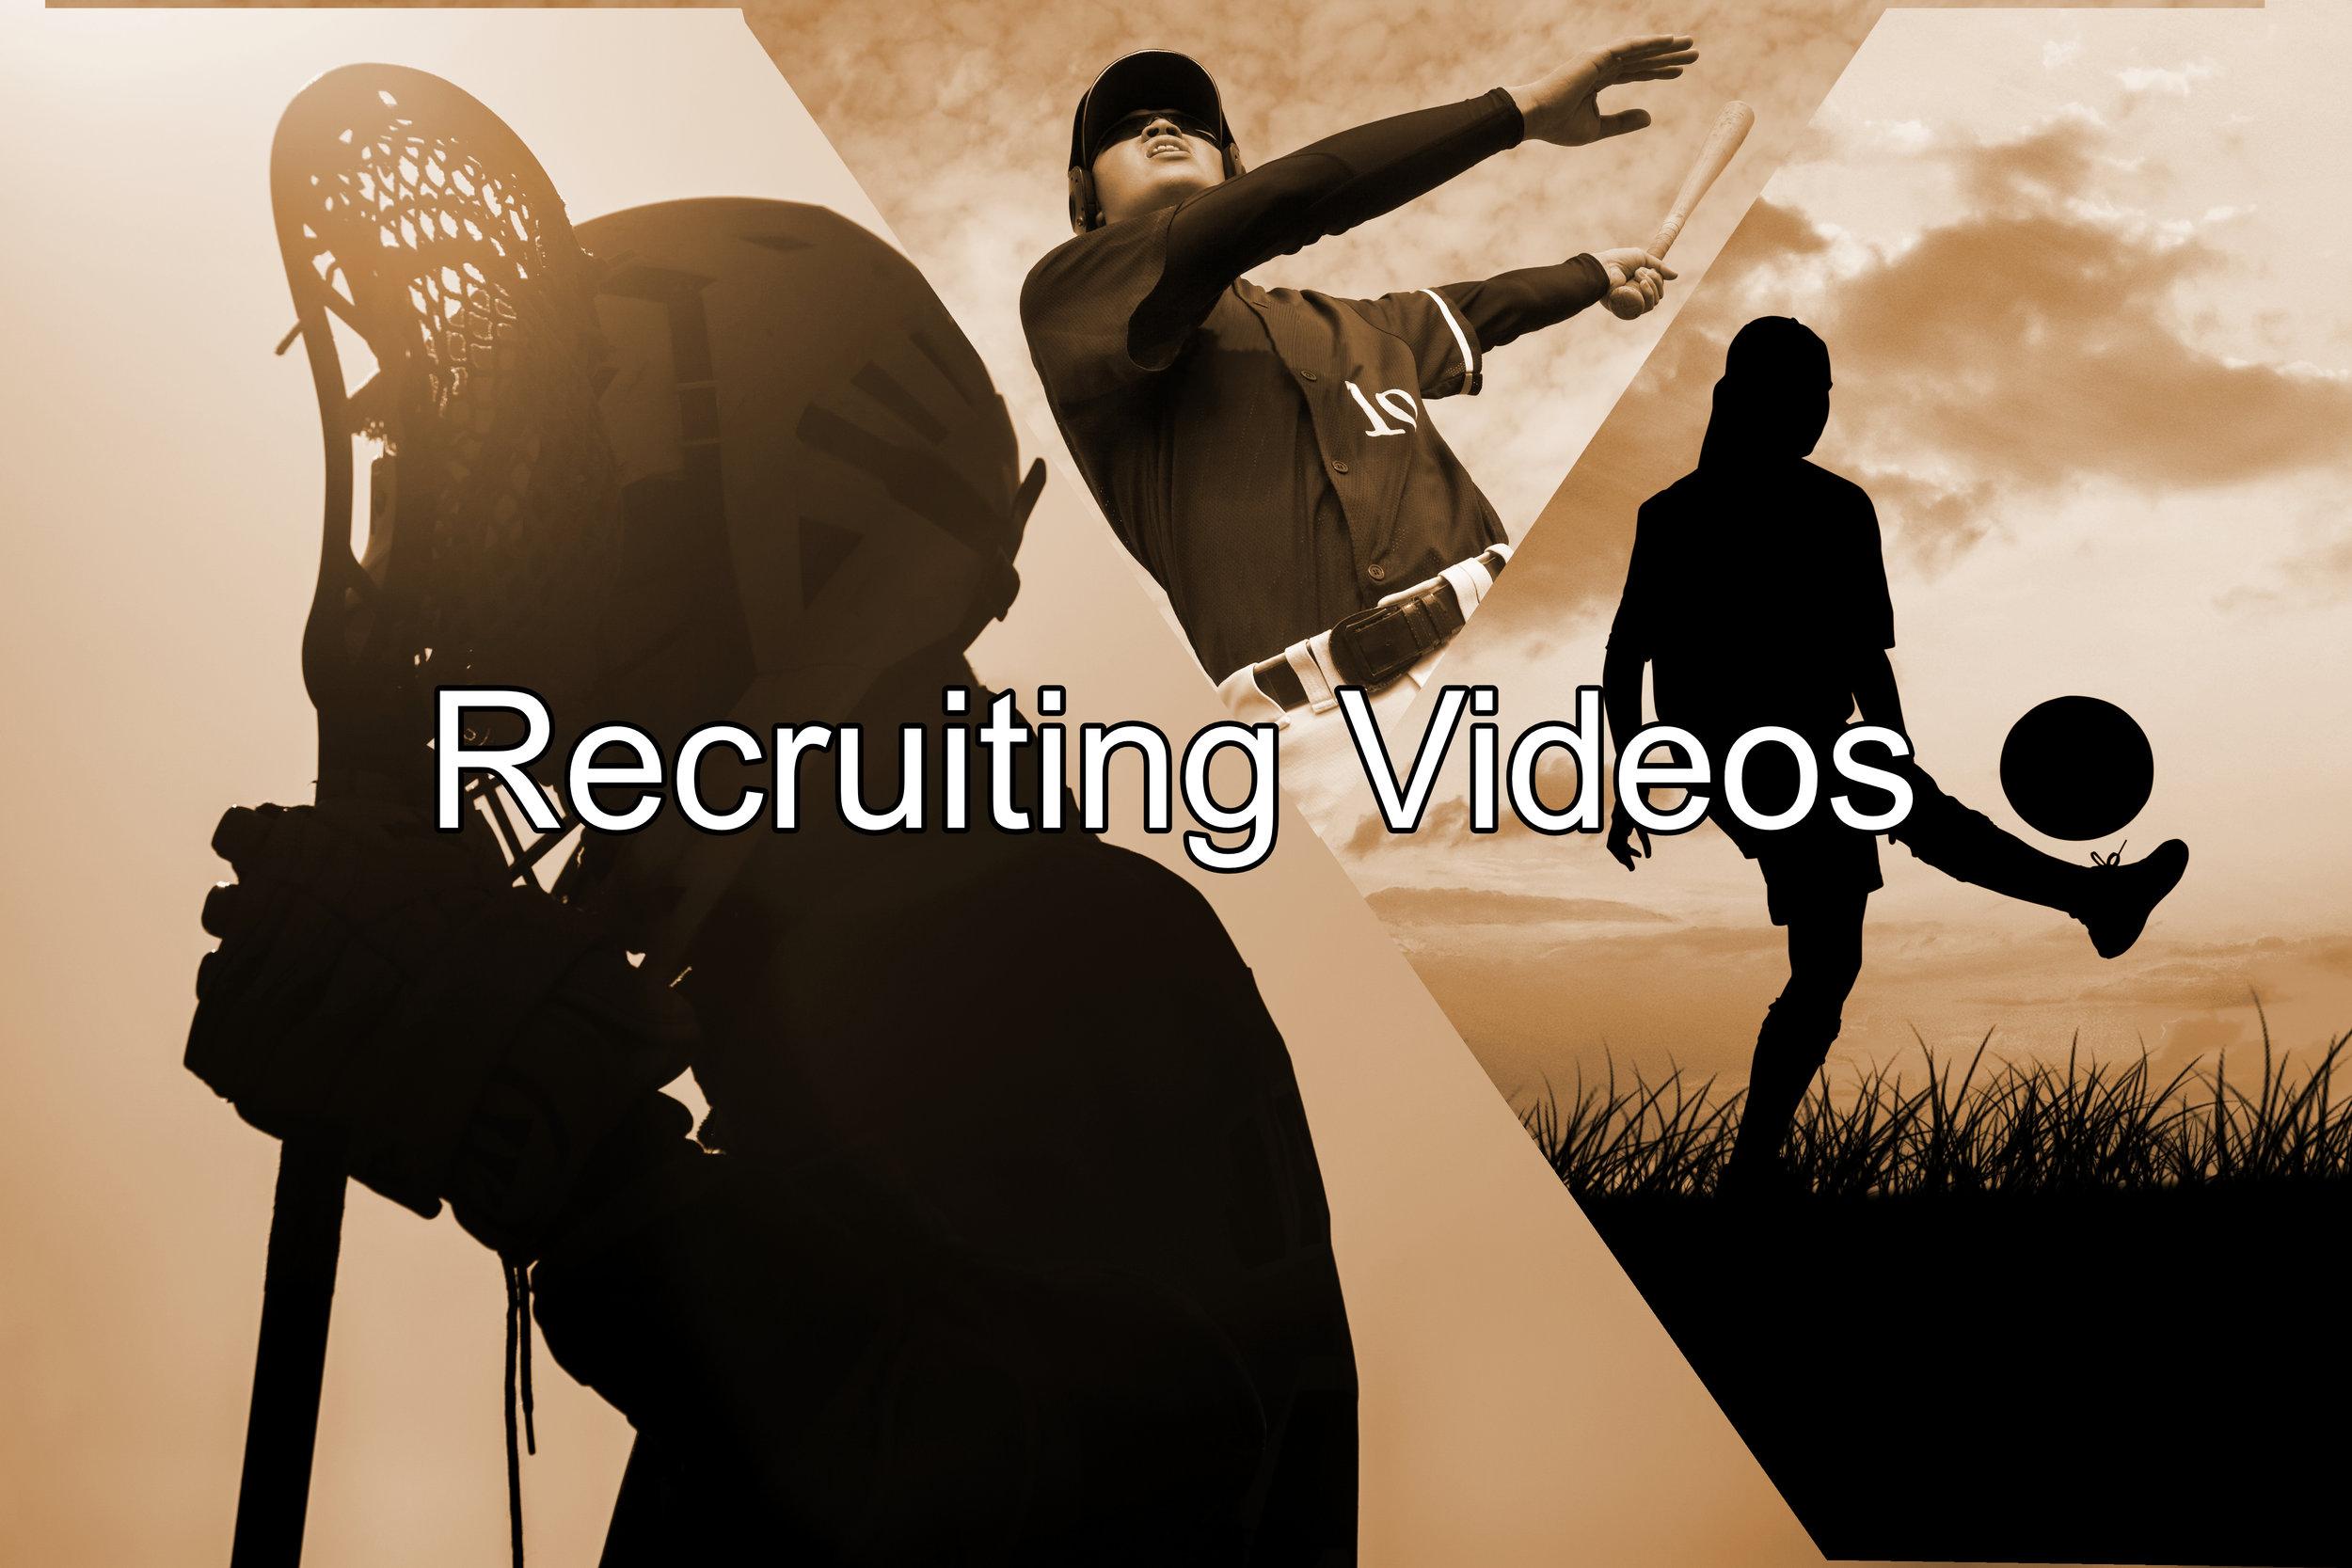 REcruiting Videos Cover.jpg